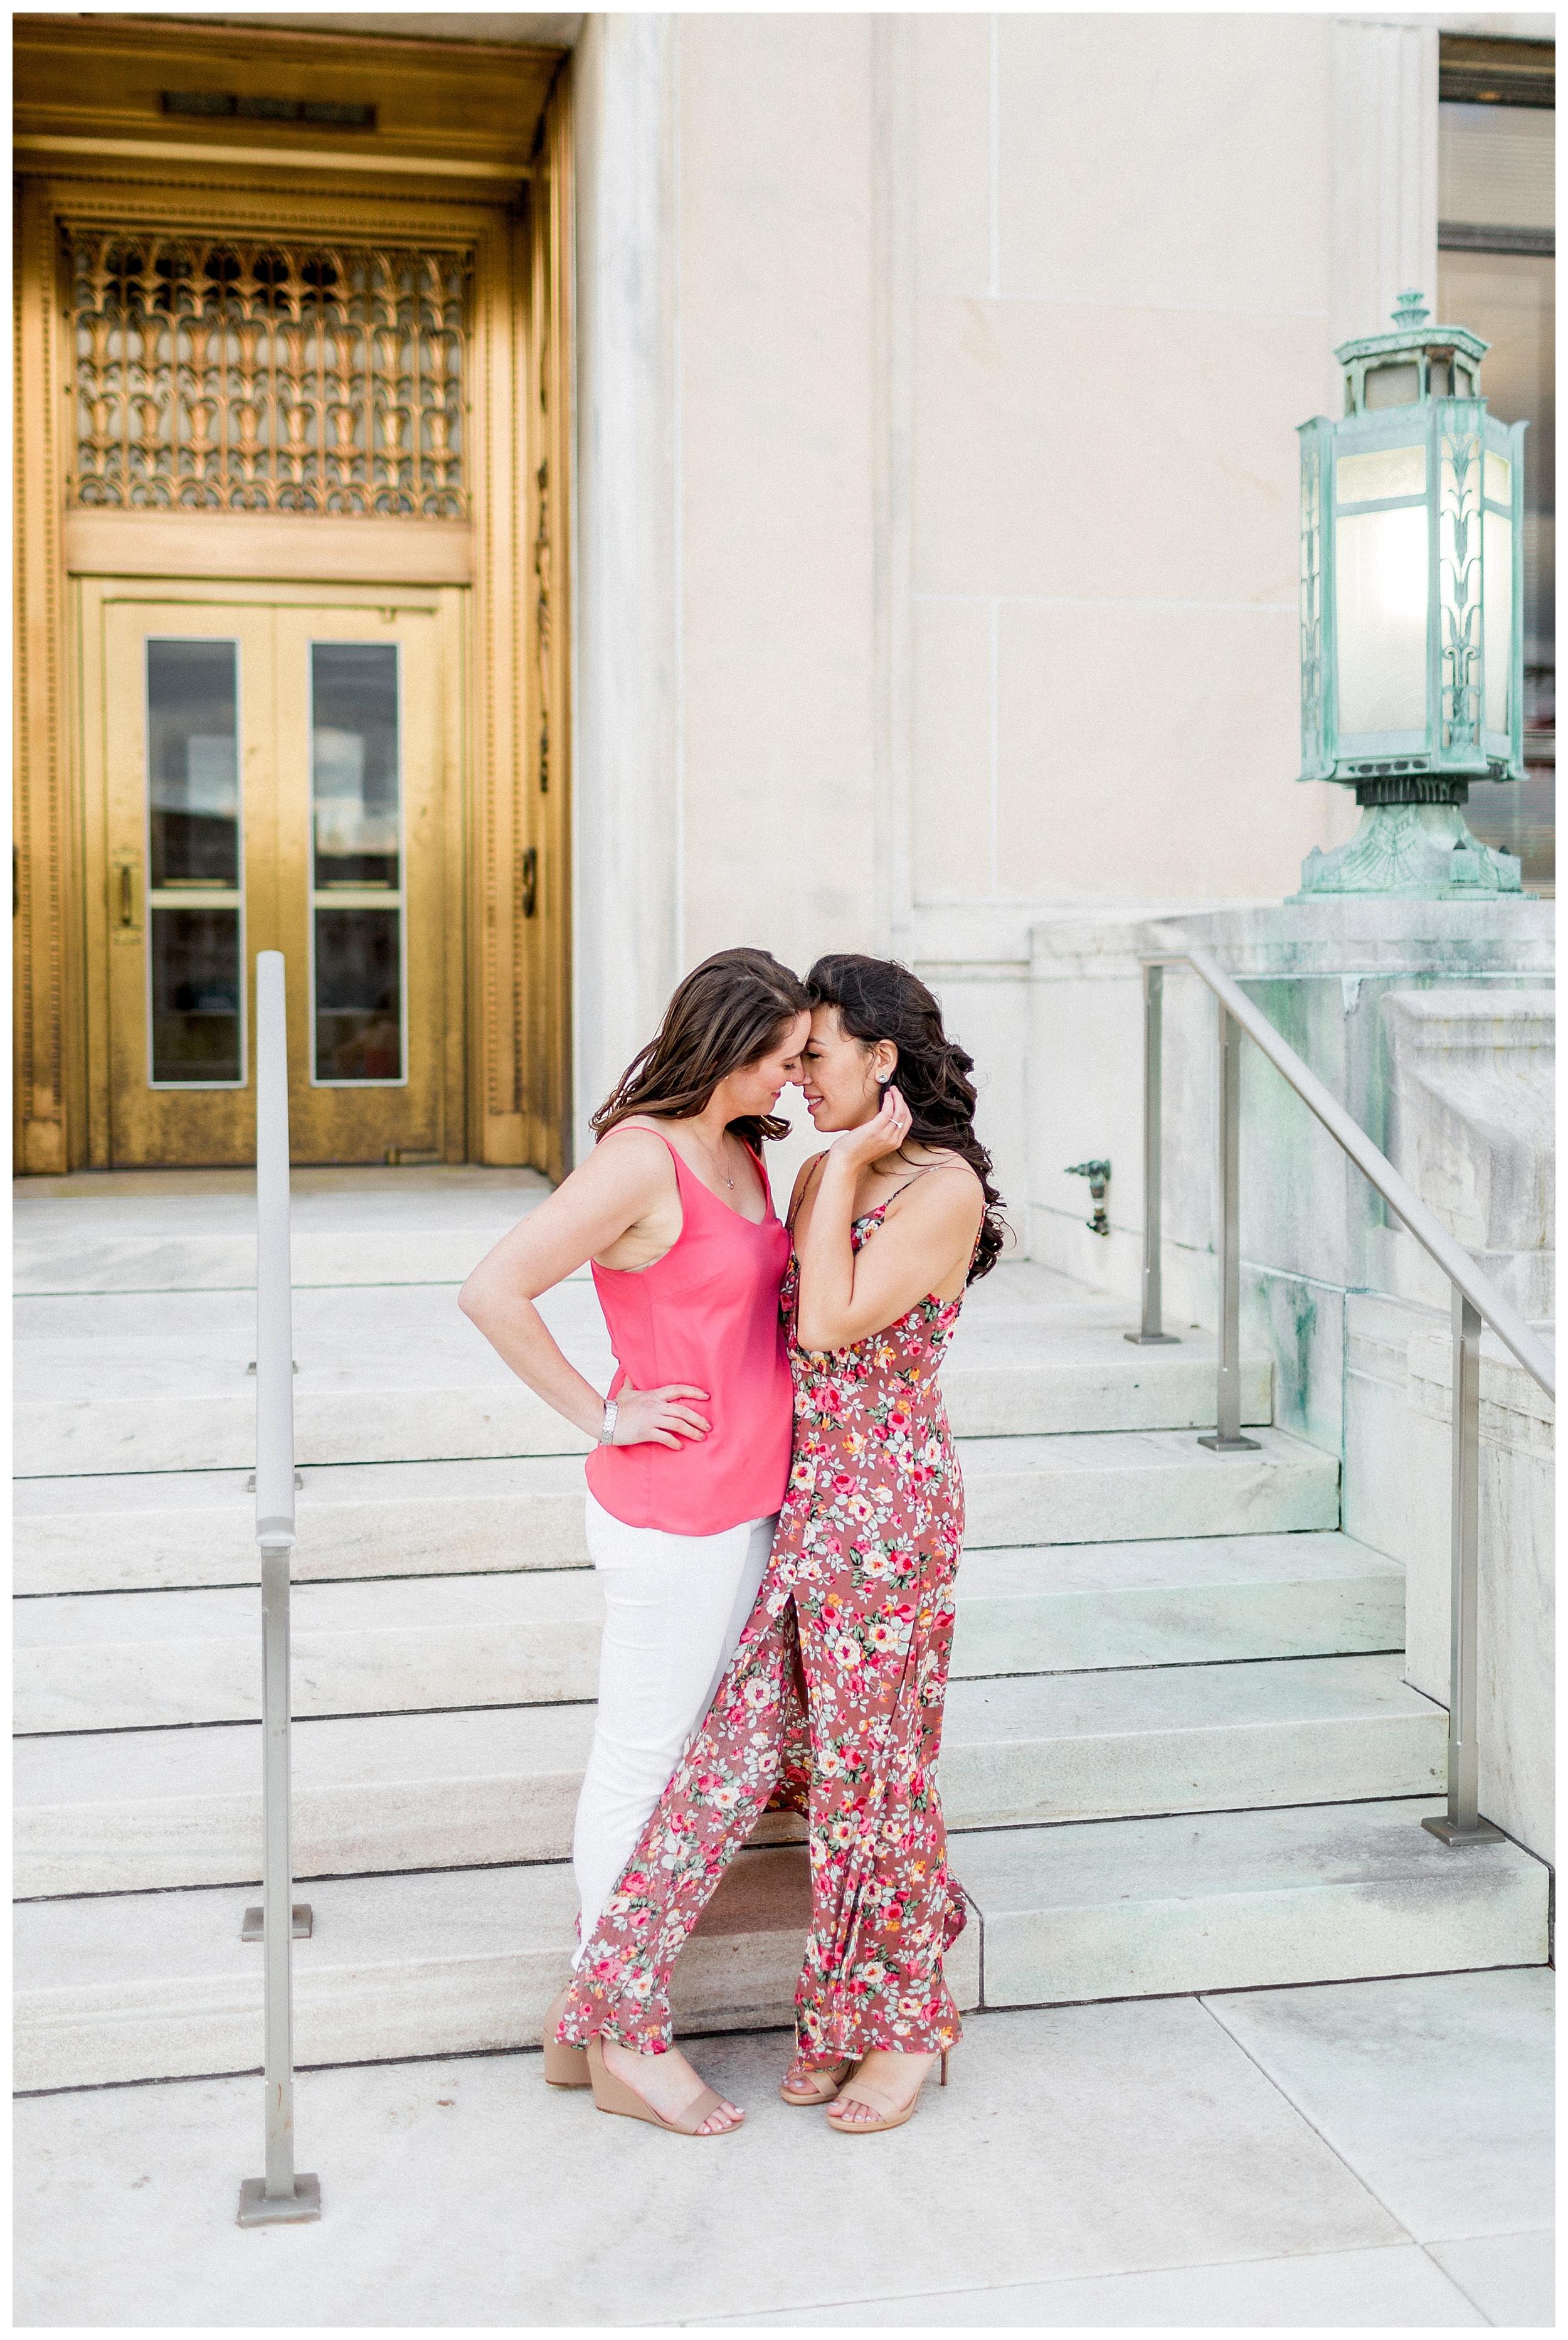 Same Sex DC Engagement | District of Columbia Wedding Photographer Kir Tuben_0025.jpg